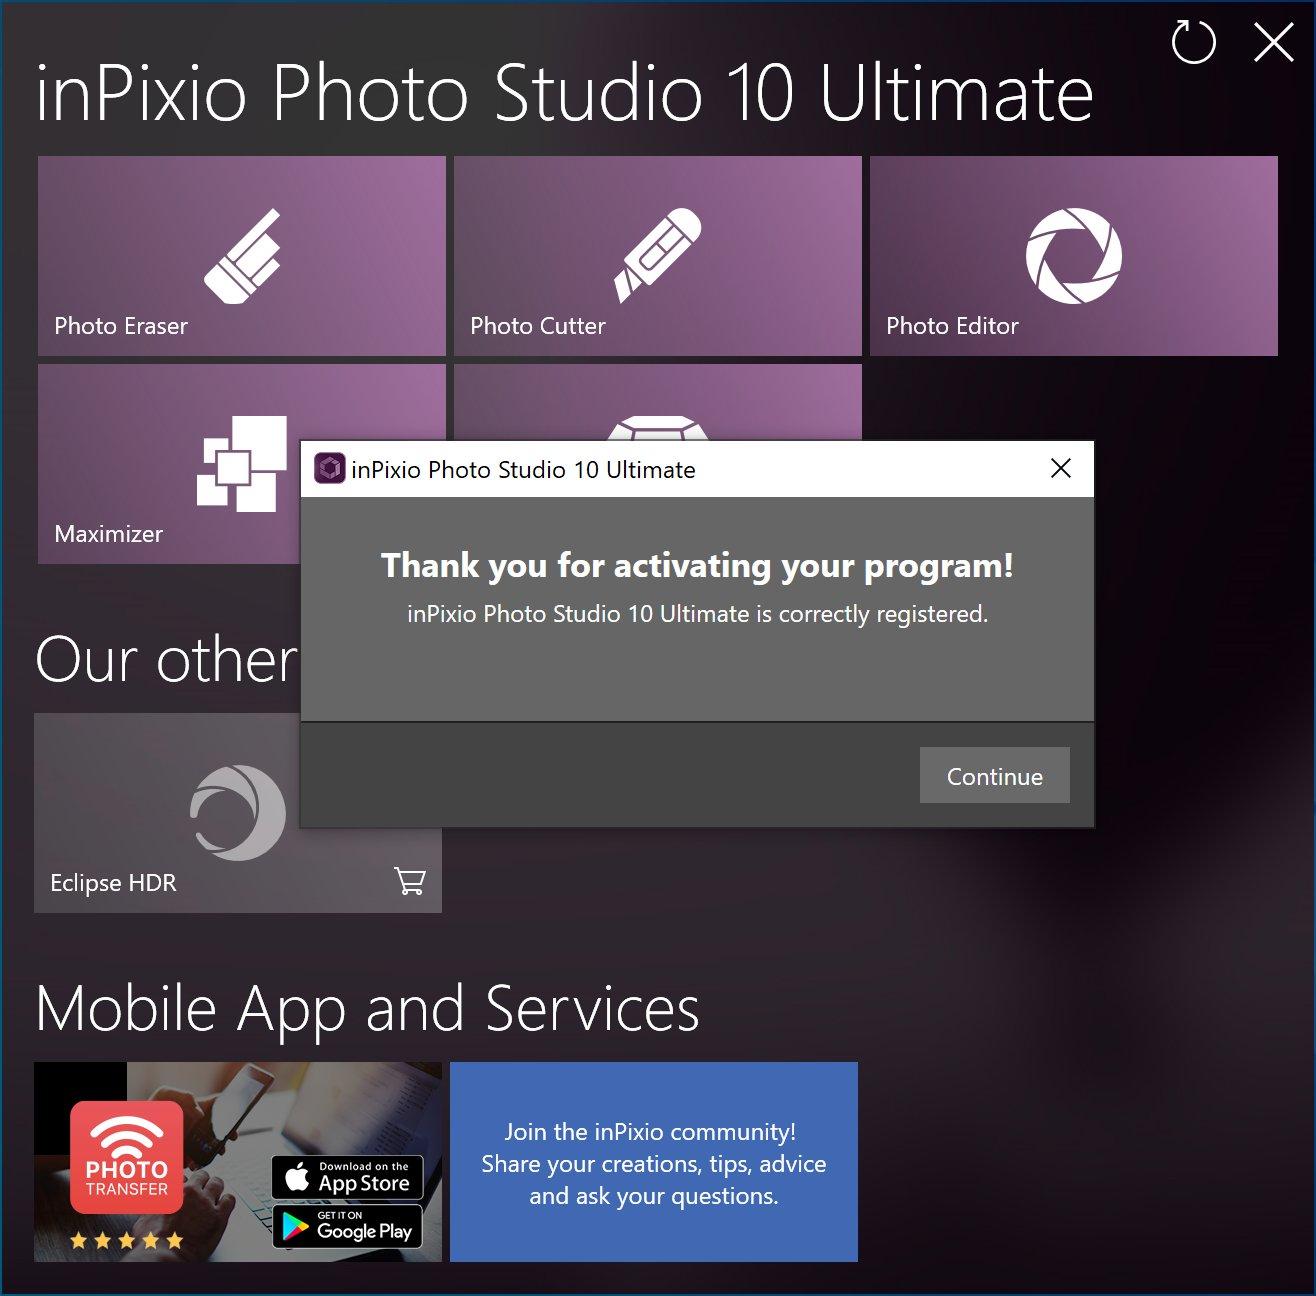 [Lifetime] InPixio Photo Studio 10 Ultimate - 3PC (2020 Latest Version) [Windows]